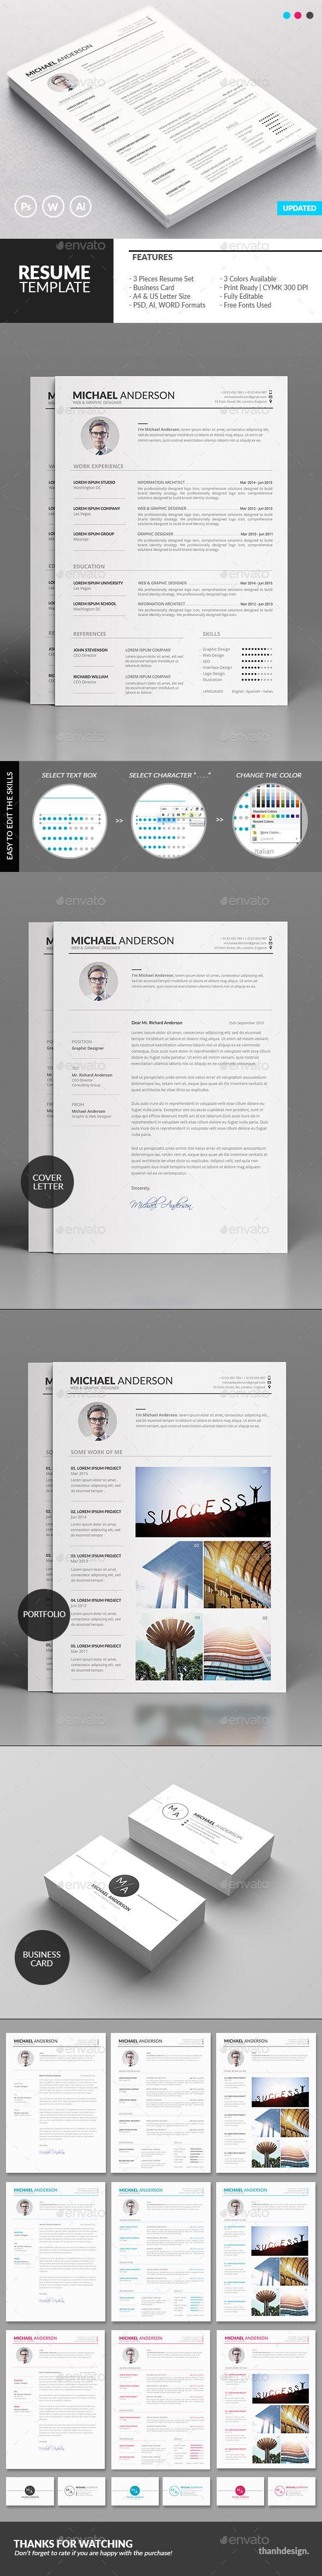 Resume Resume design template, Print design template, Resume